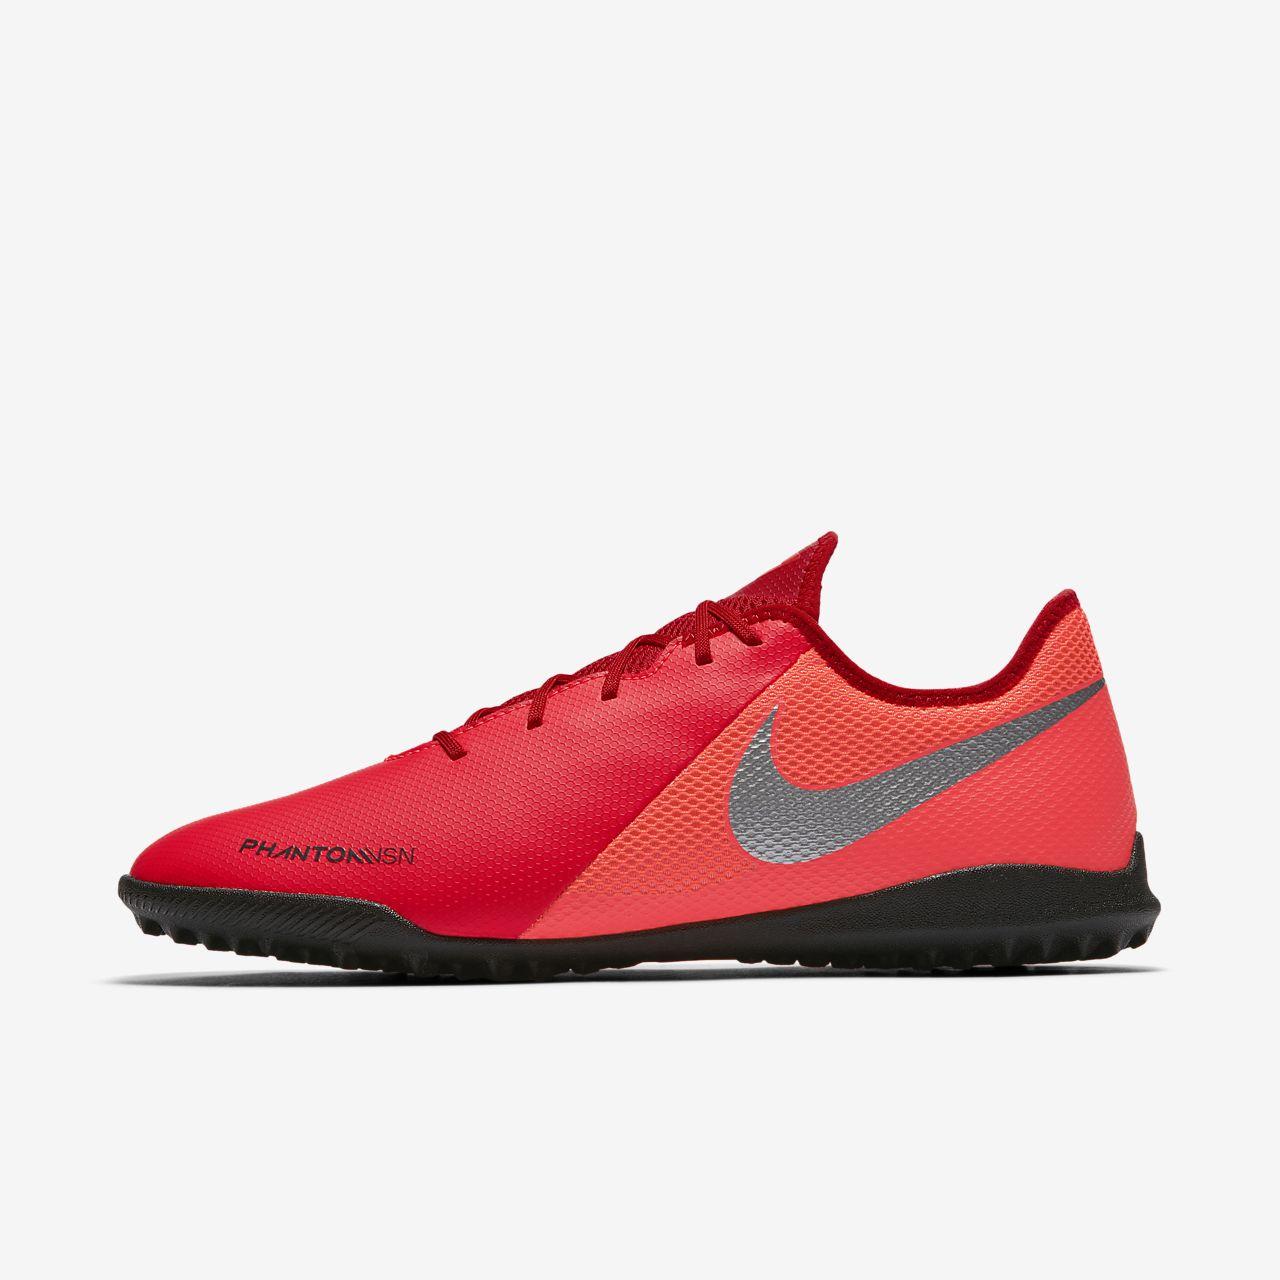 Nike Phantom Vision Academy Botas de fútbol para moqueta artificial - Turf f08bb6bbbf870